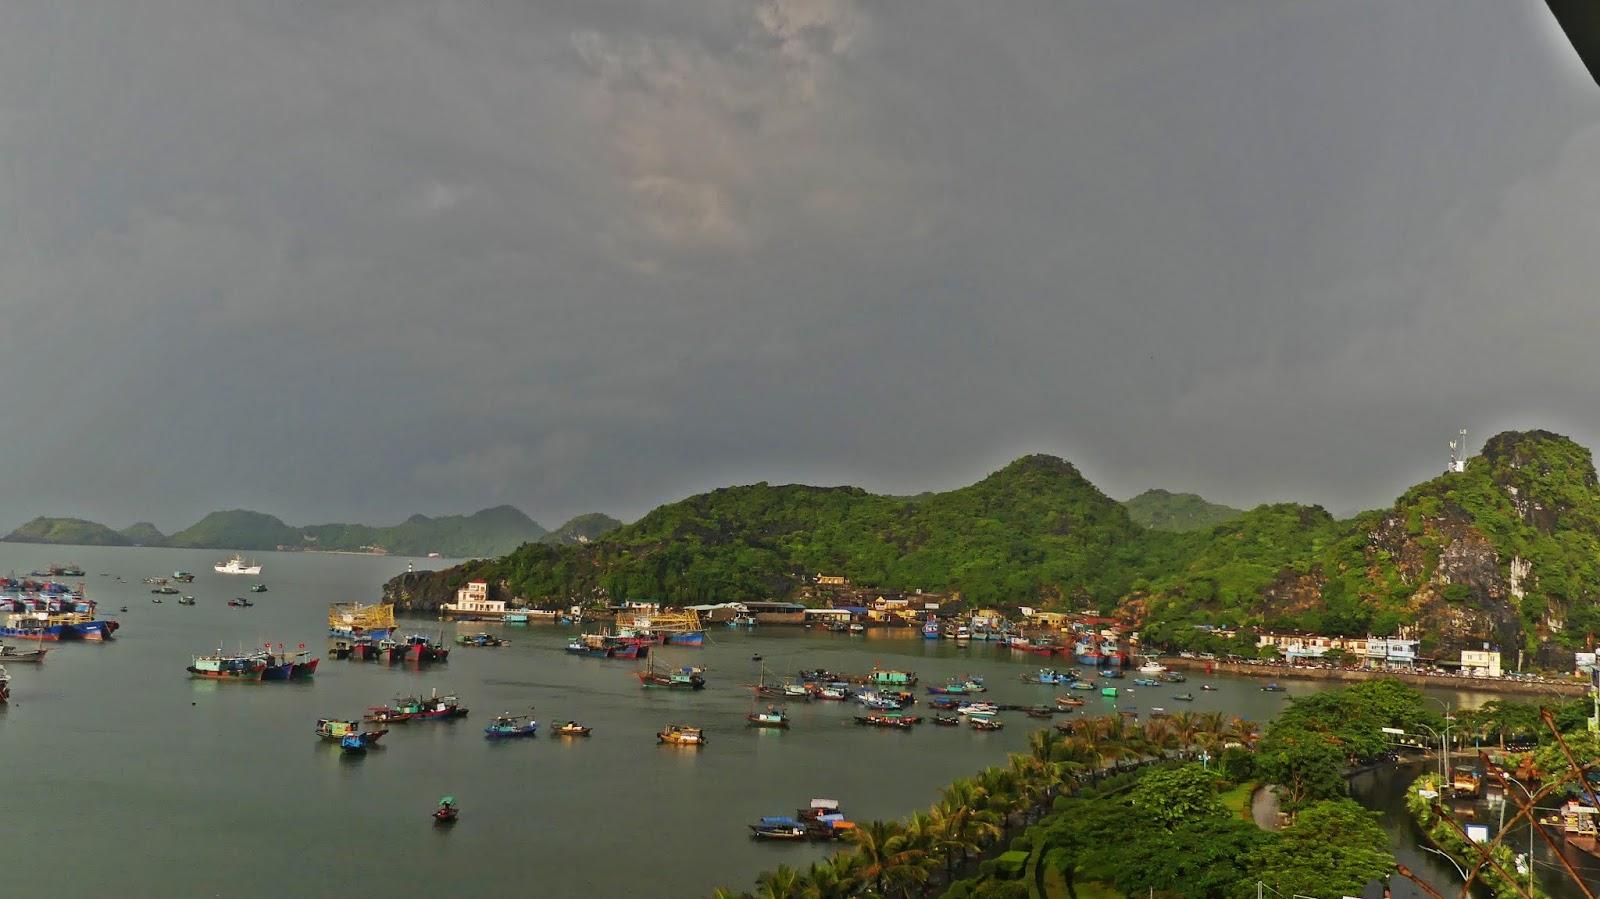 noclegi na Cat Ba w wietnamie, zatoka